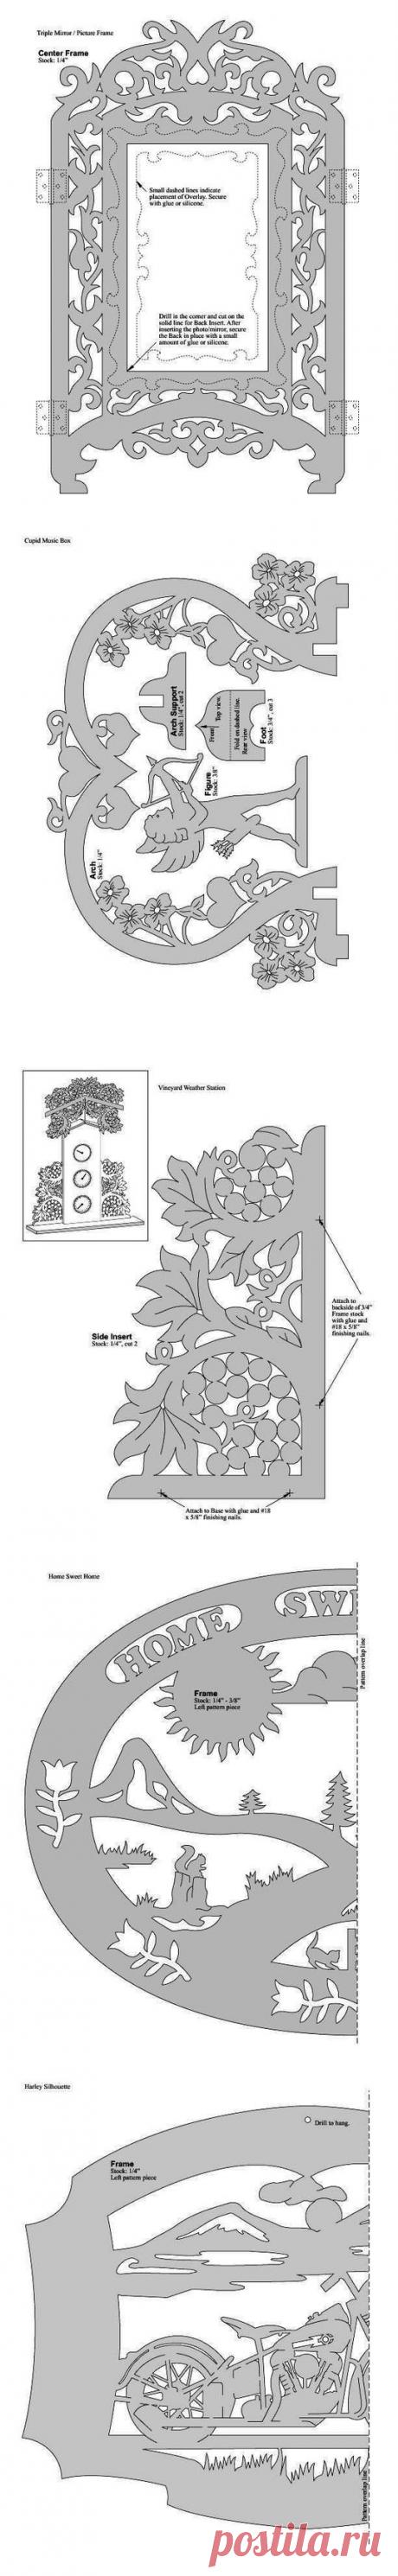 Шаблоны для выпиливания. Great American Scrollsaw Patterns